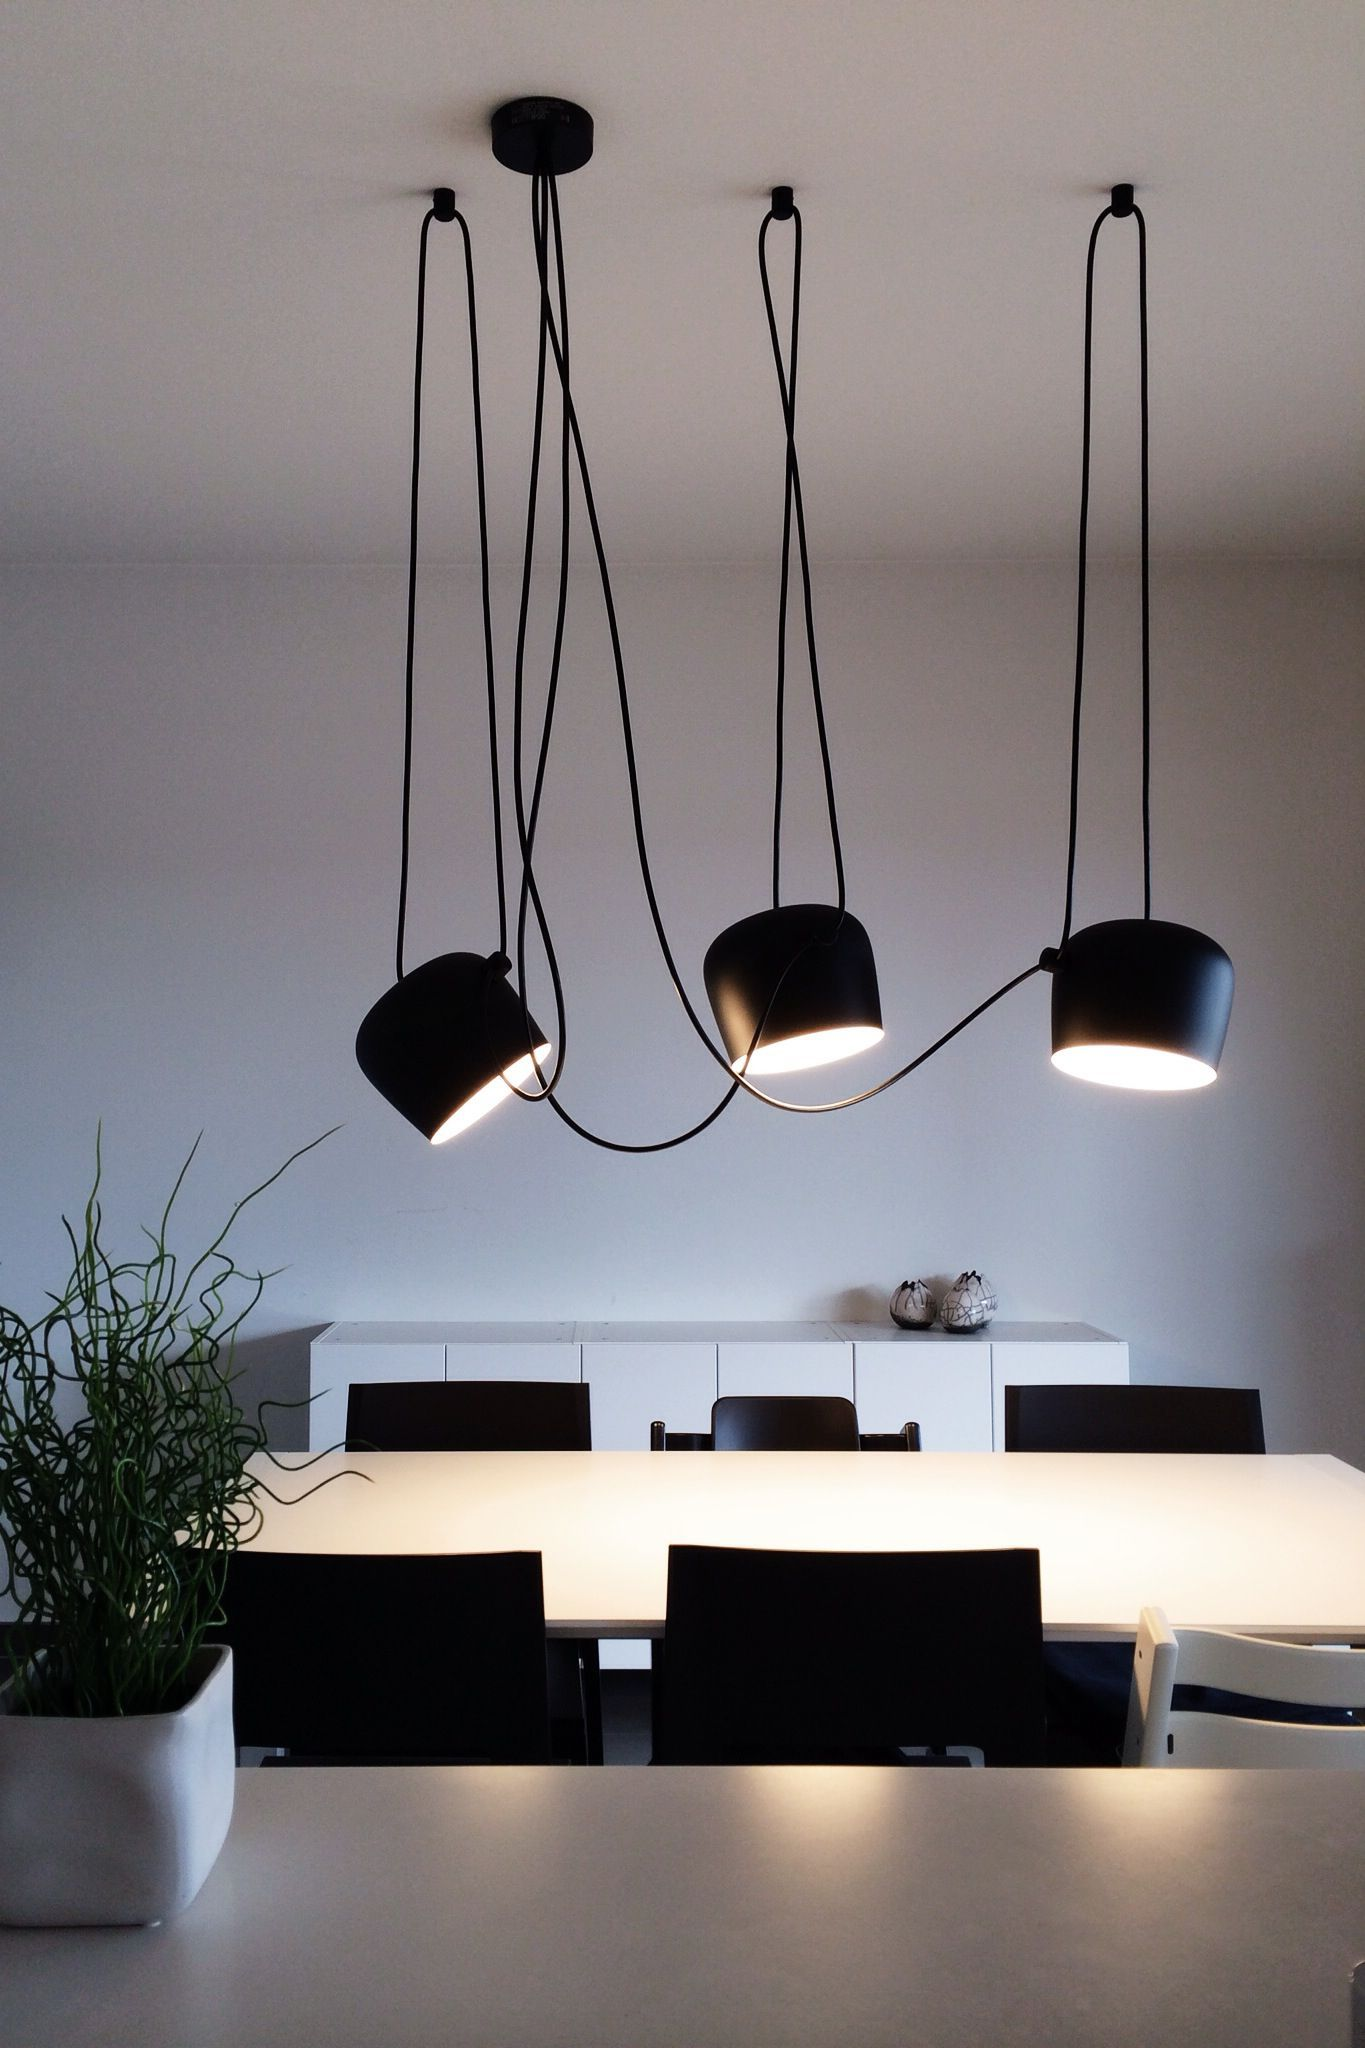 Aim Flos Dining Table Lamp Vintage Floor Lamps Mid Century Modern